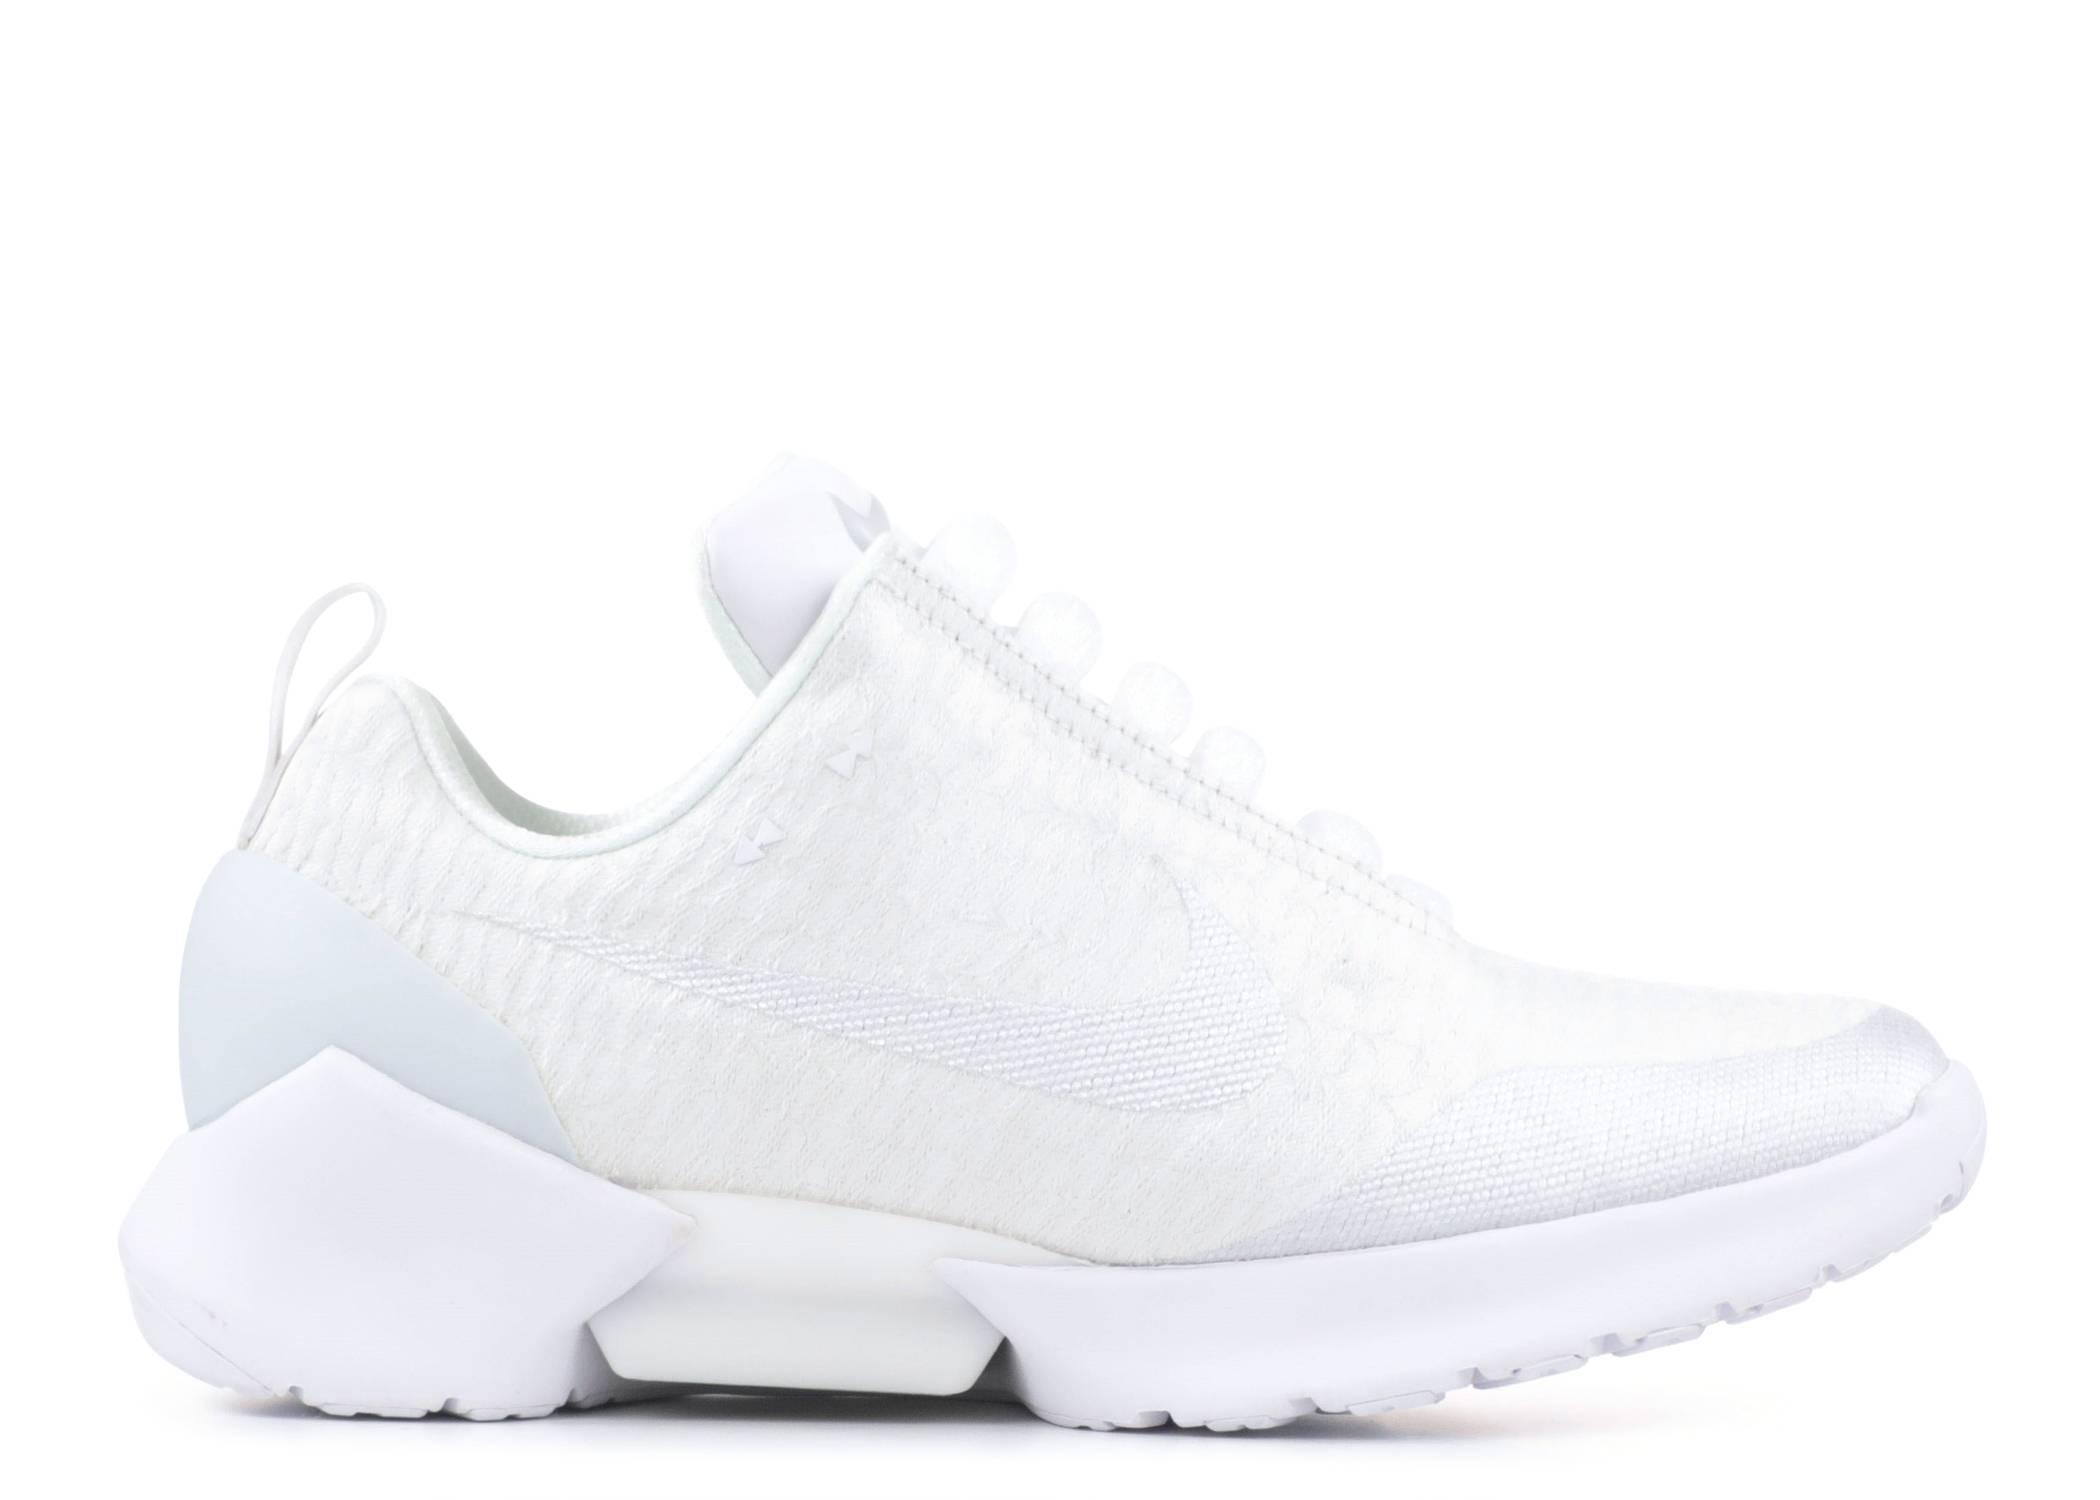 24abbb4ed2d06 Nike Hyper Adapt 1.0 - Nike - 843871 102 - white/pure platinum ...